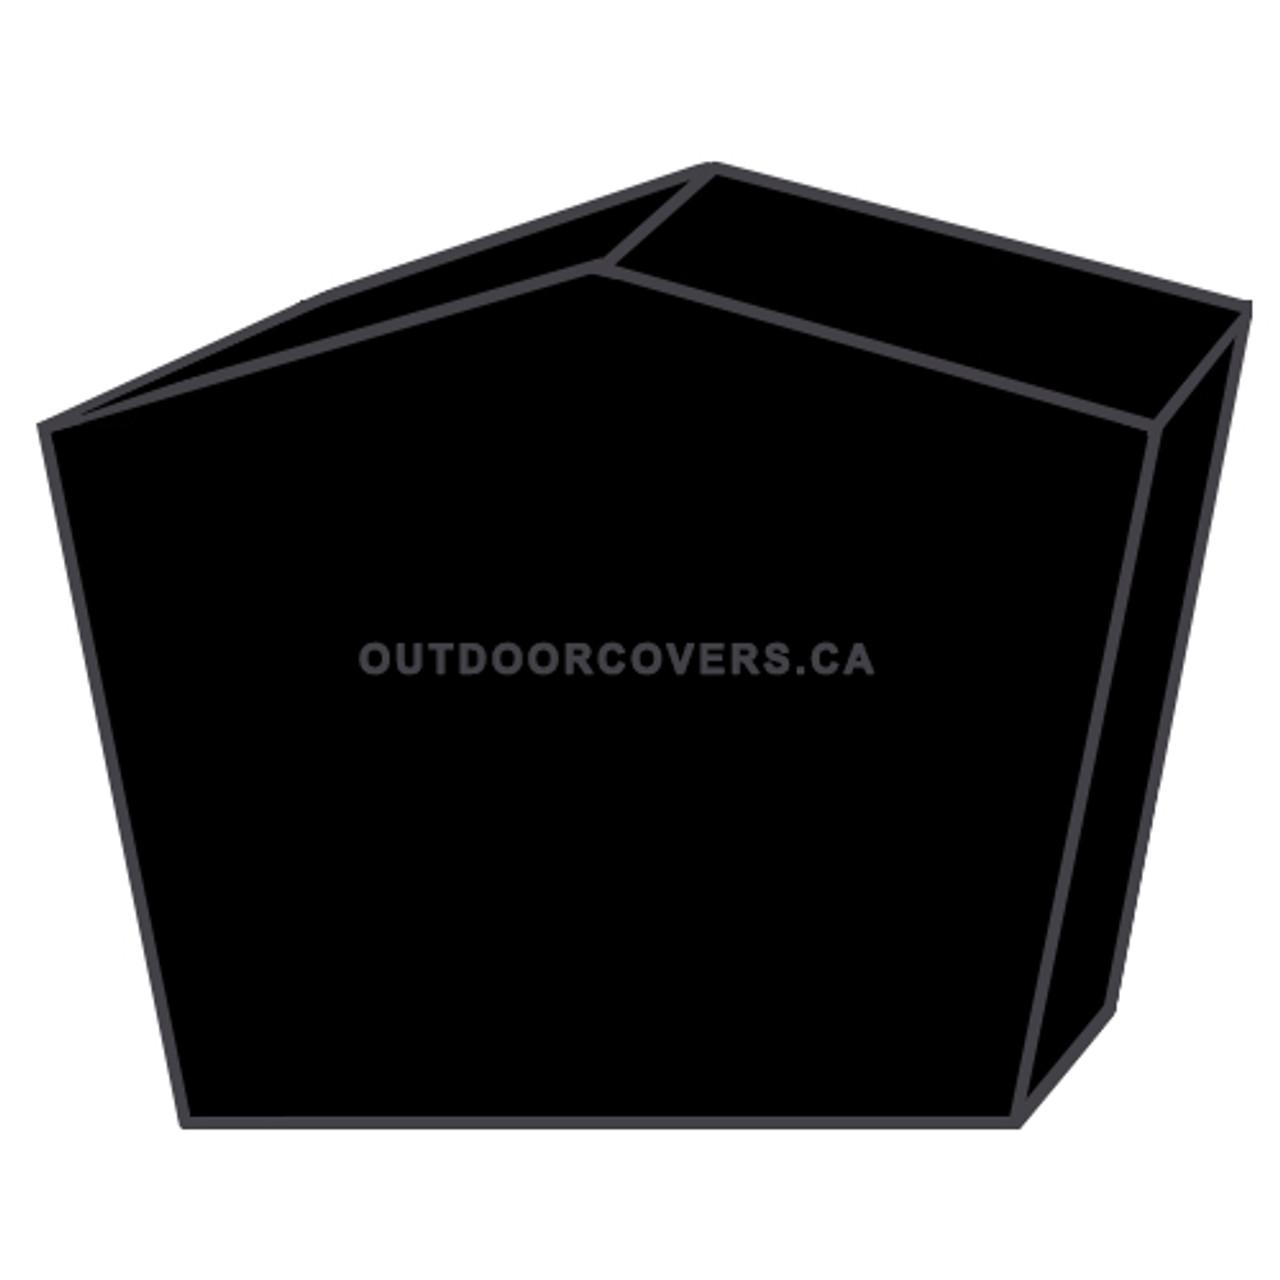 Advantage table saw cover shape